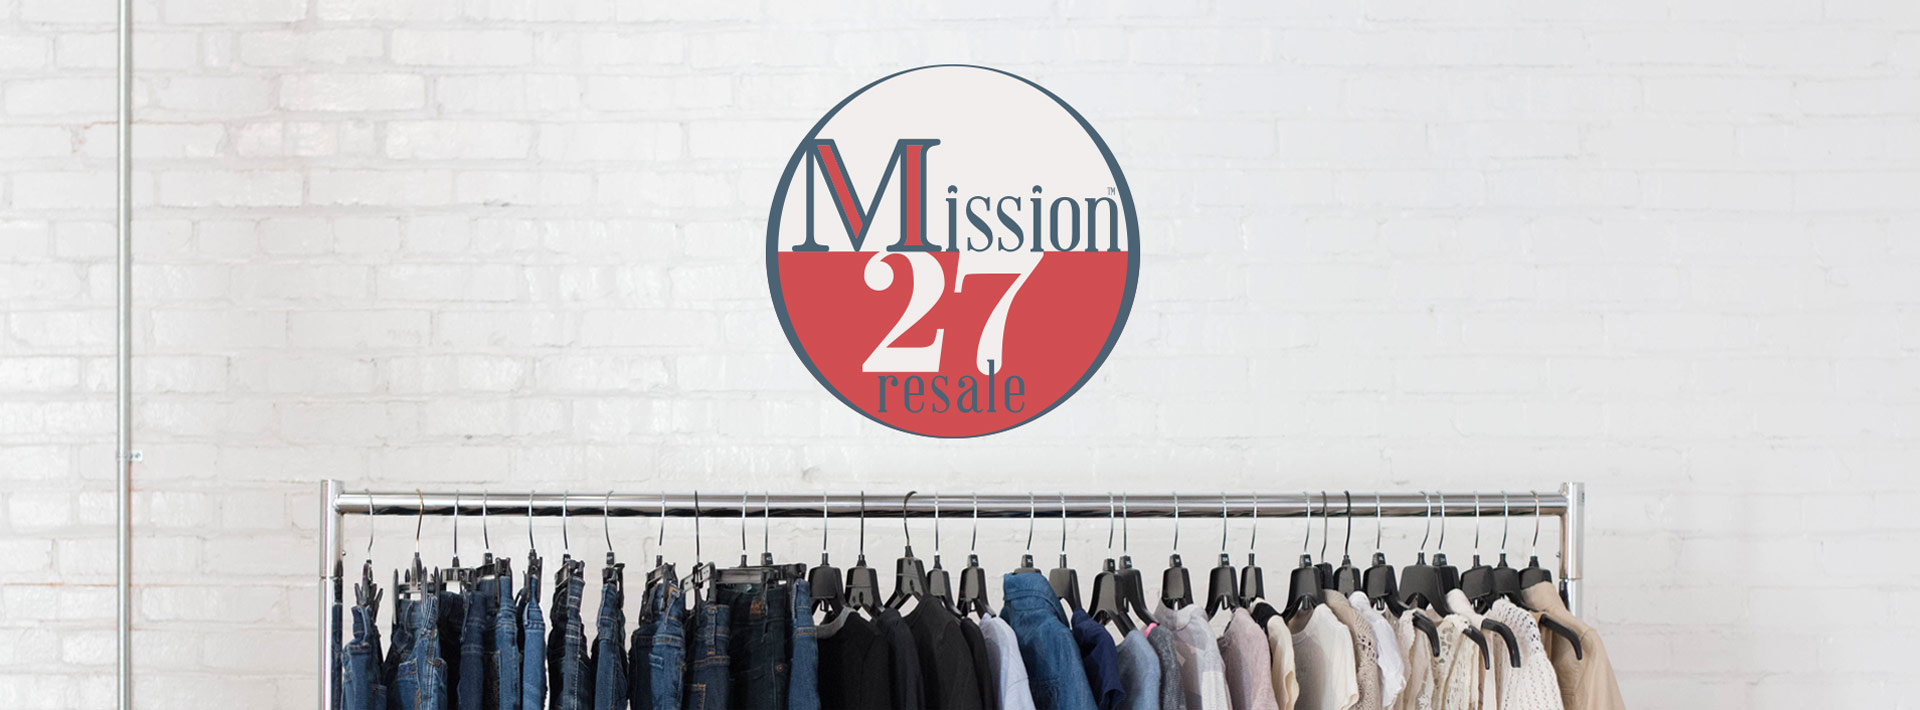 mission27-headerslide1b.jpg